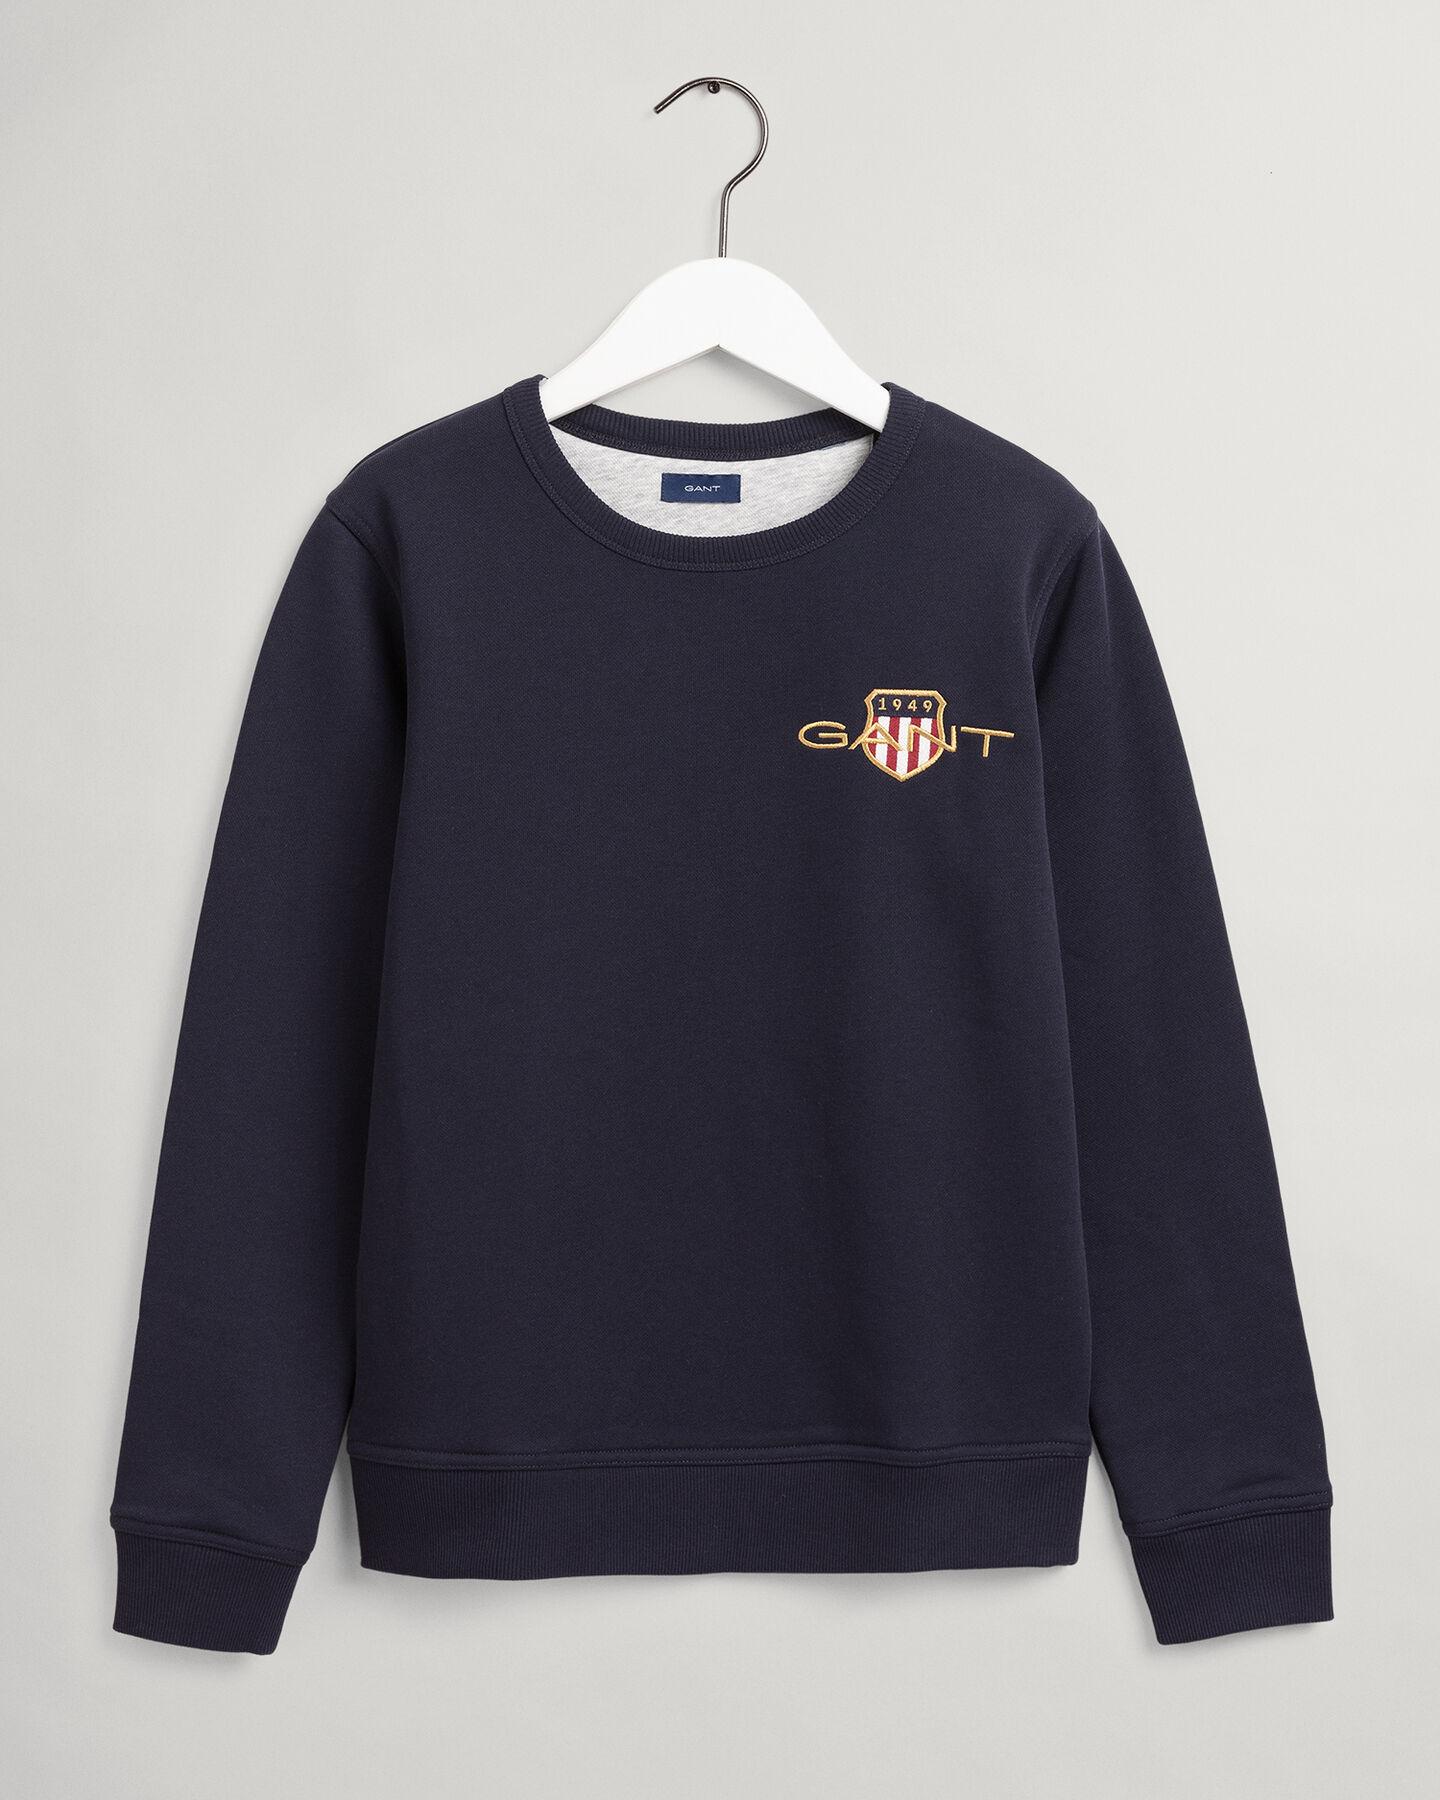 Teens Archive Shield broderad sweatshirt med rund halsringning